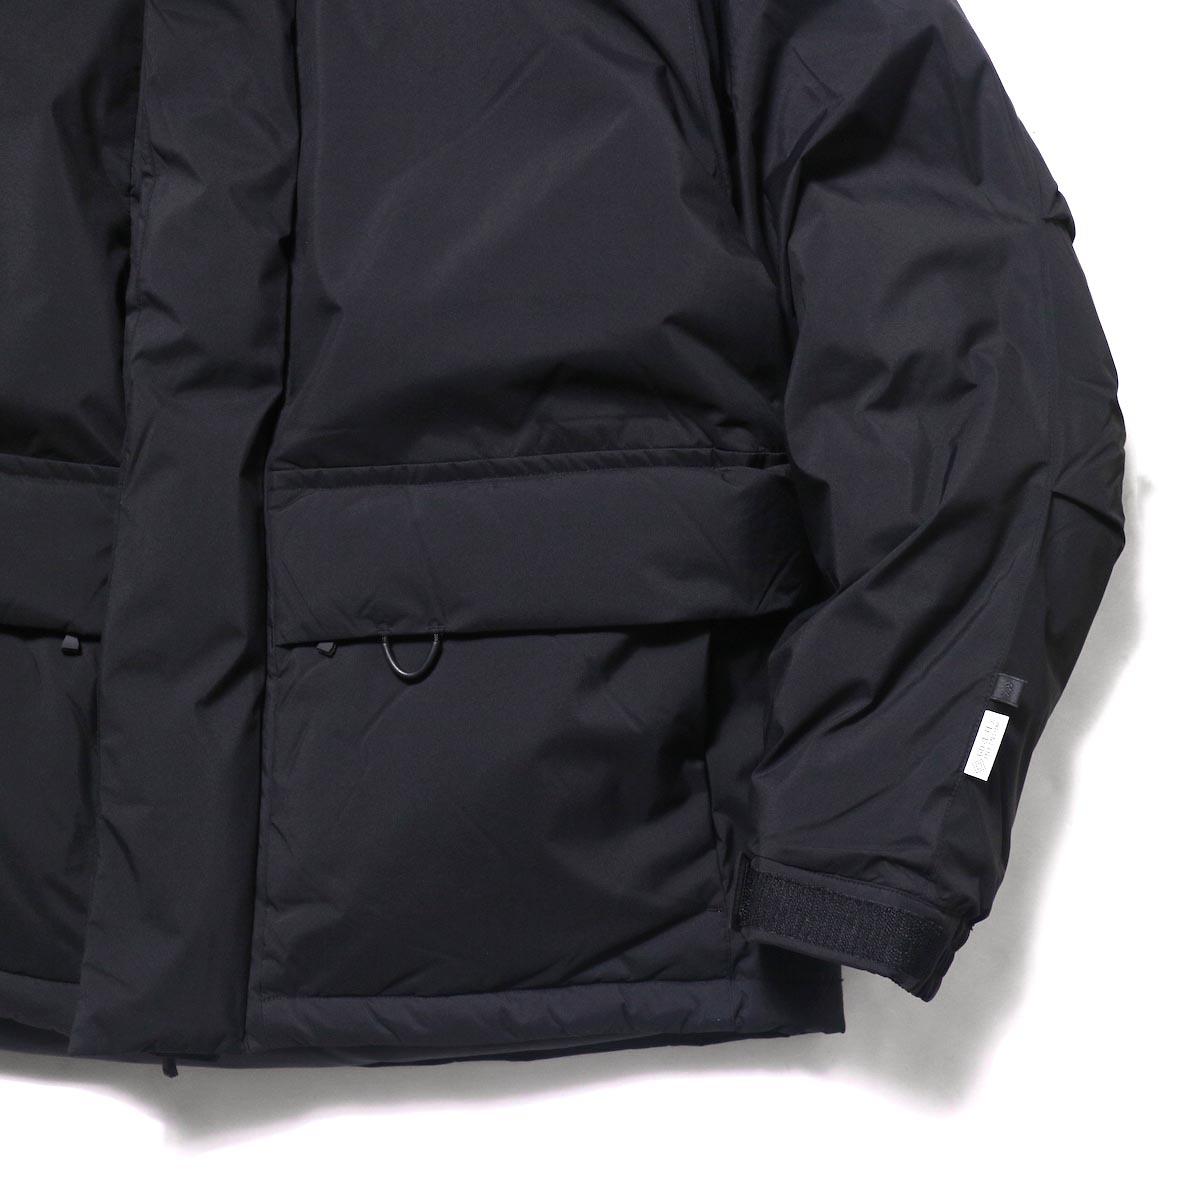 DAIWA PIER39 / GORE-TEX INFINIUM EXPEDITION DOWN JACKET (Black)袖、ポケット